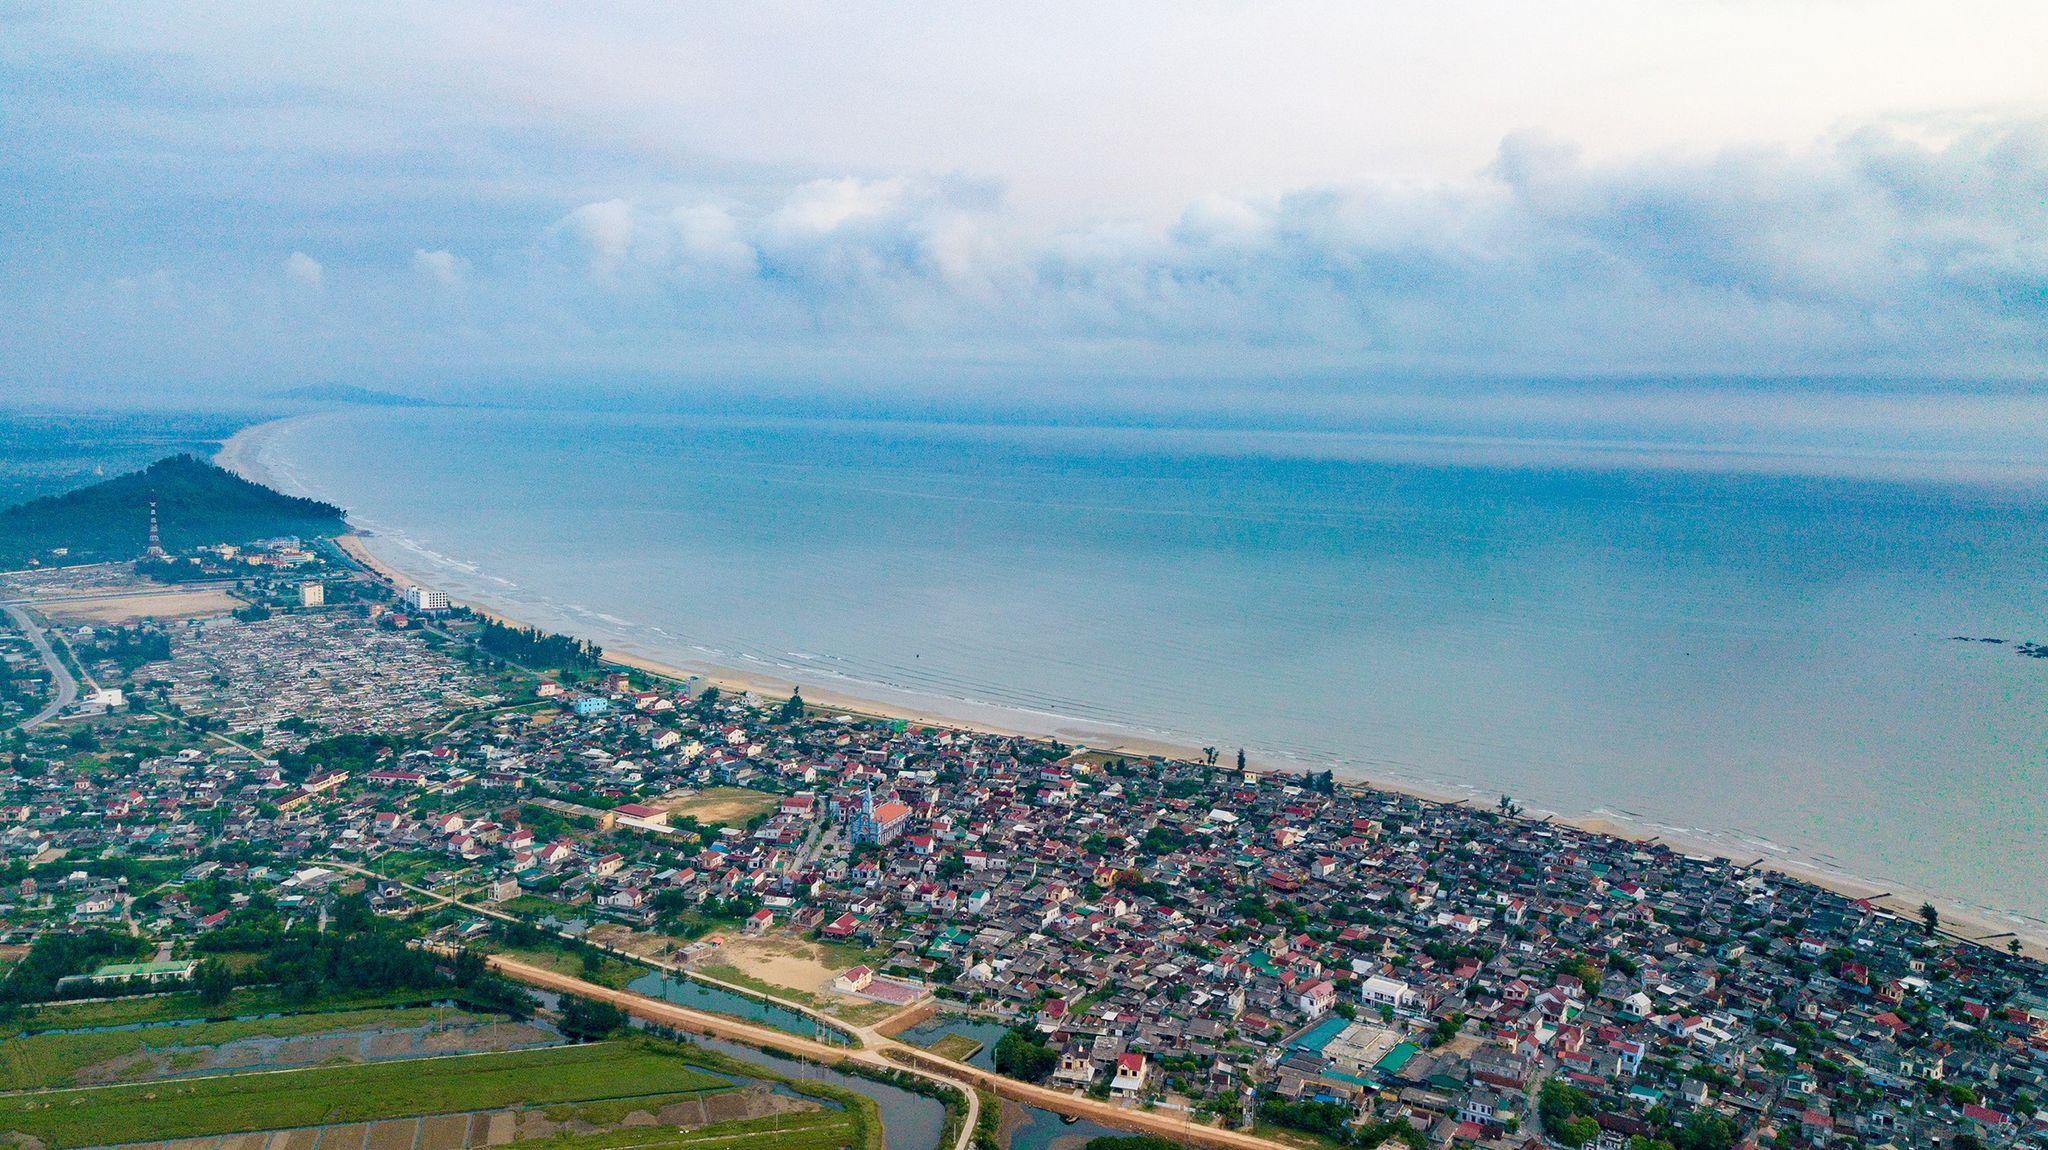 Thien Cam Beach in Ha Tinh Province looks from afar. Photo: Nam Tran/Tuoi Tre